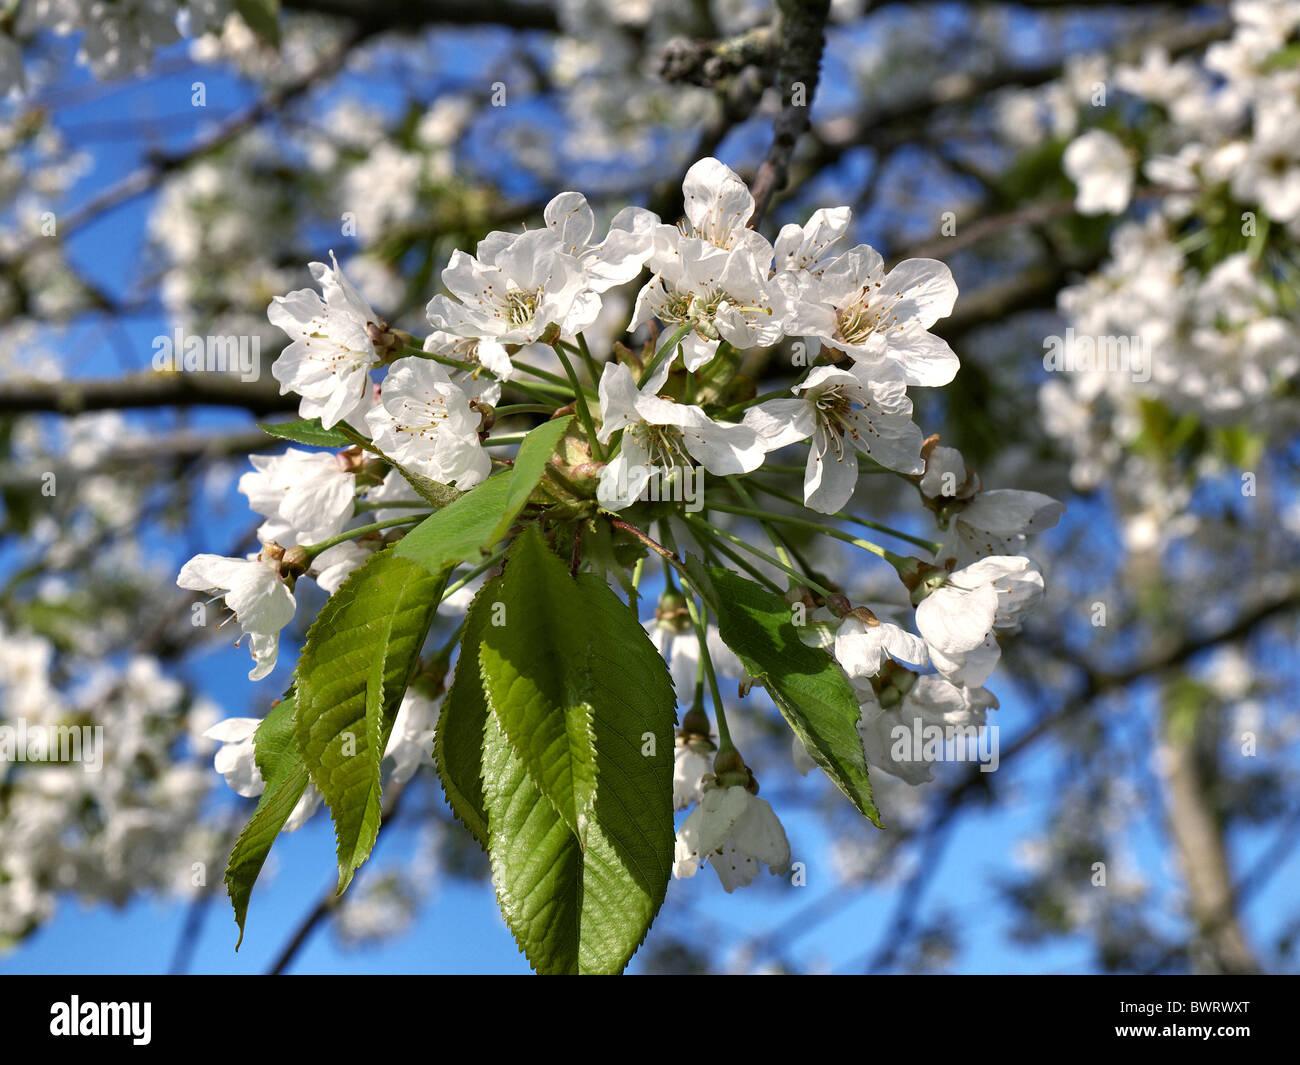 Cherry tree in full bloom. - Stock Image